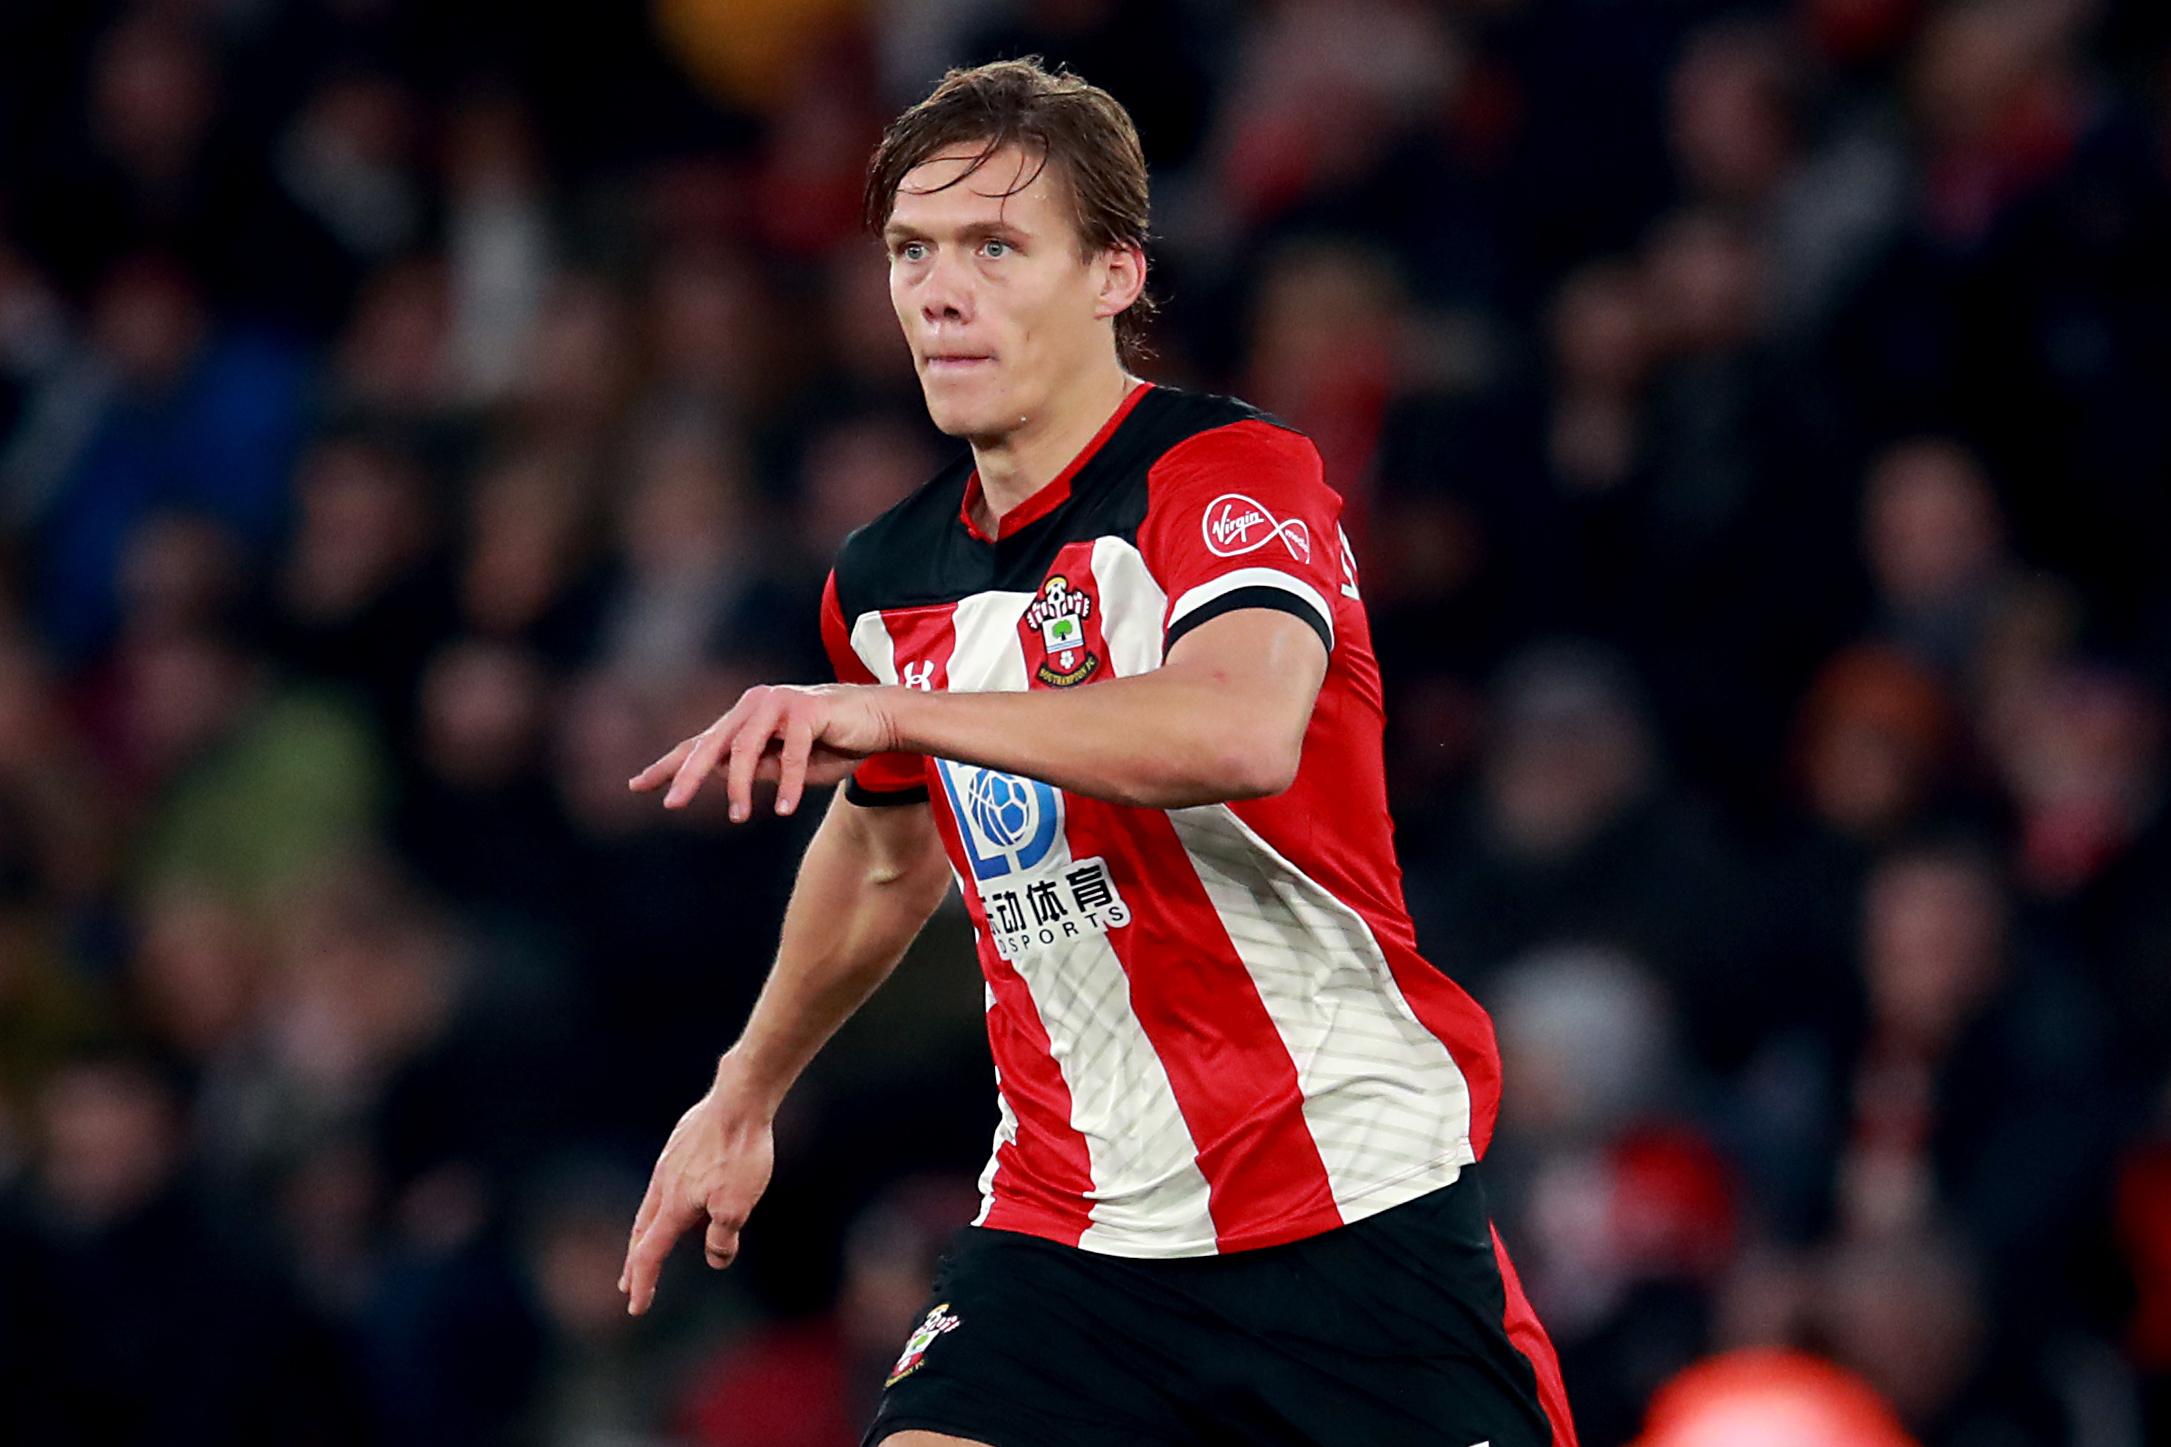 'I definitely see myself staying at Saints' - Jannik Vestergaard hopeful of 'bigger role' this season